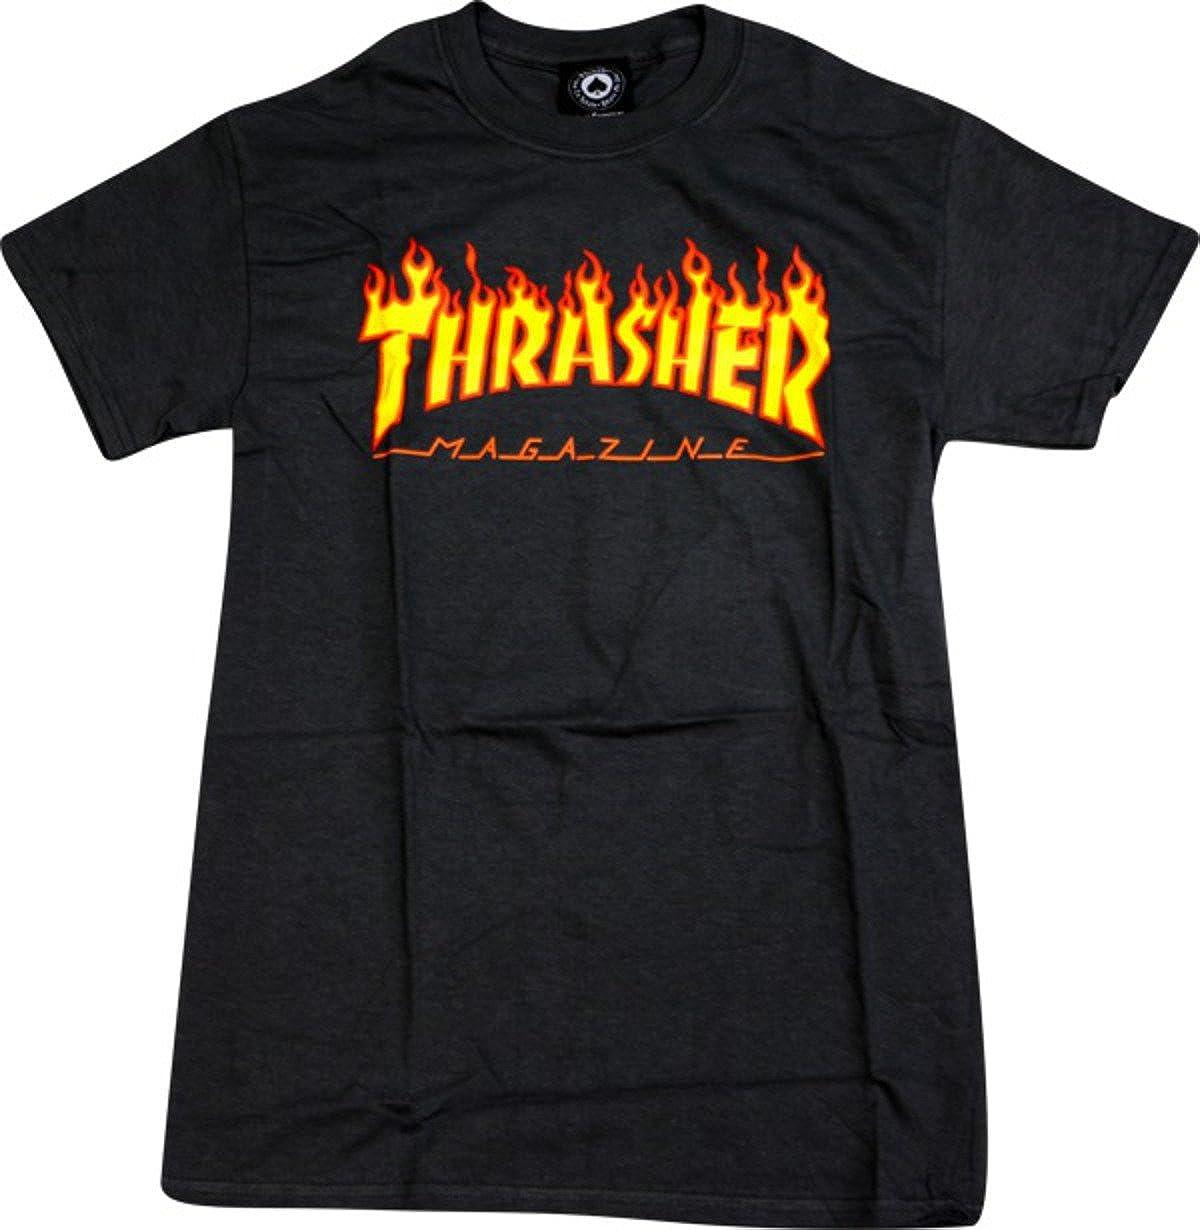 Thrasher Magazine Flame Black Small T-Shirt